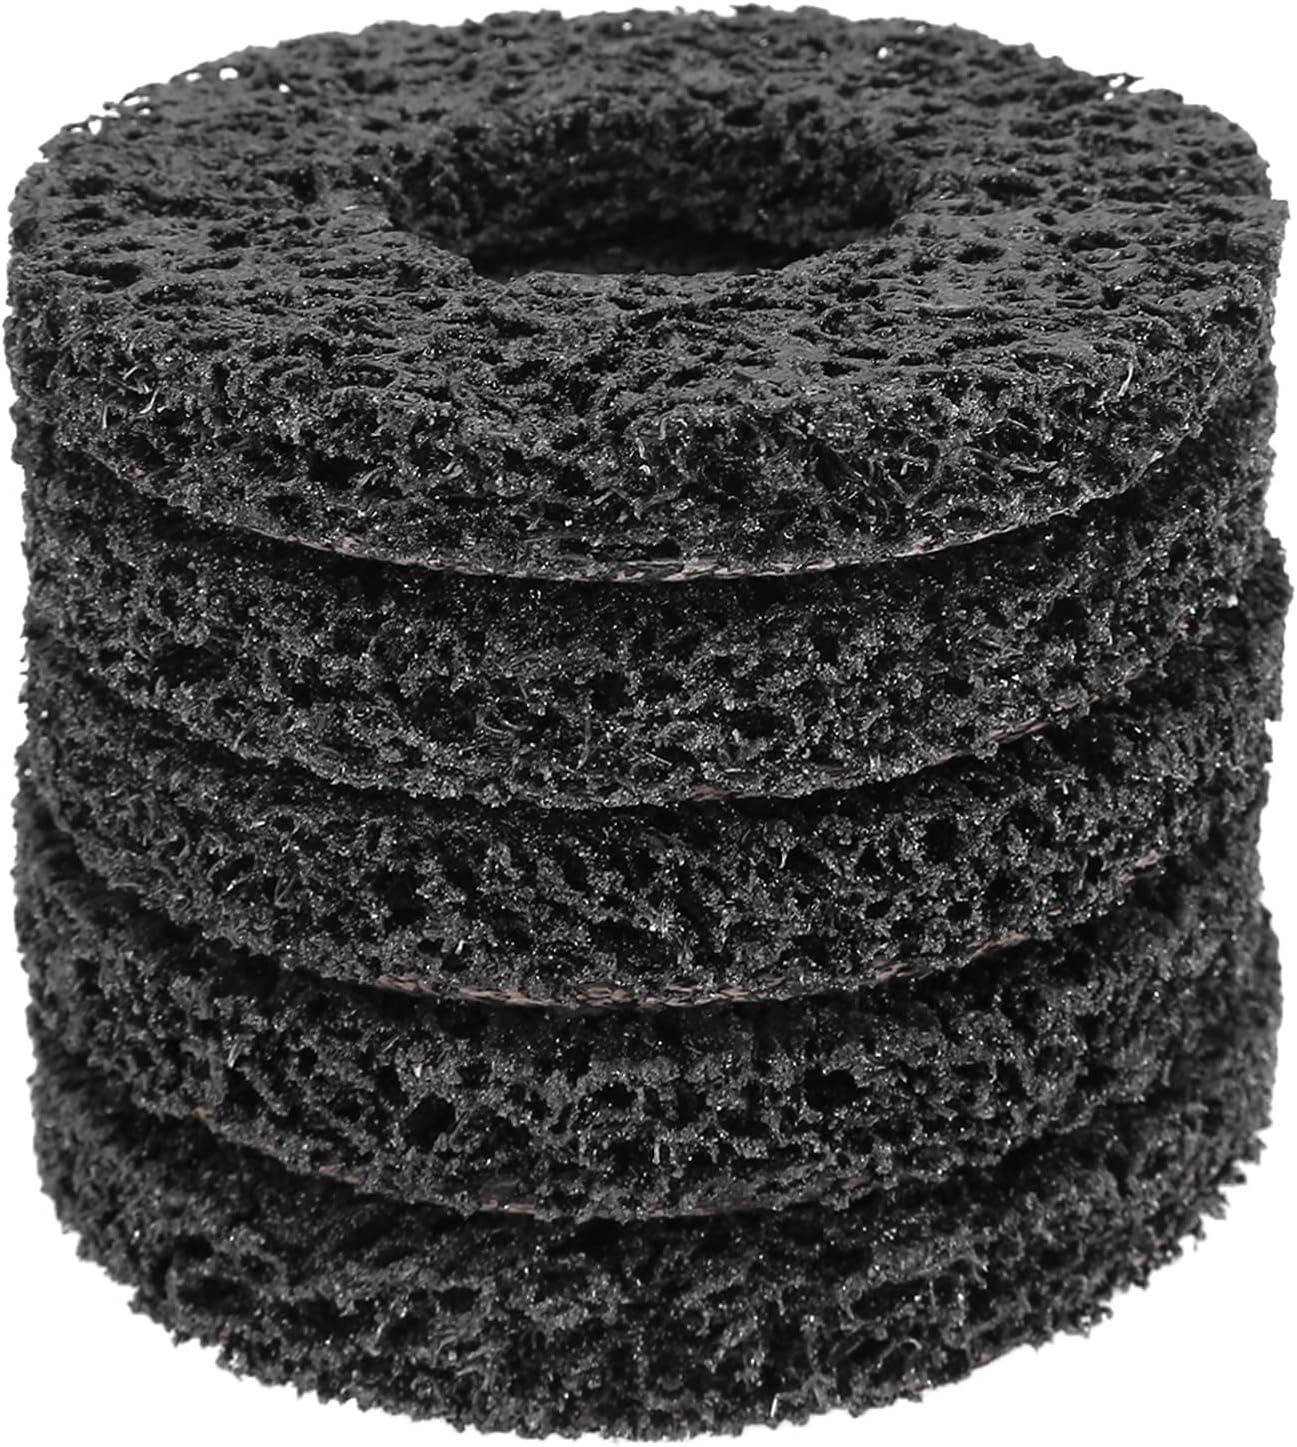 YYDMBH Import Cutting wheele 5Pcs Strip Grit Polishing Grinding Wh Virginia Beach Mall Disc